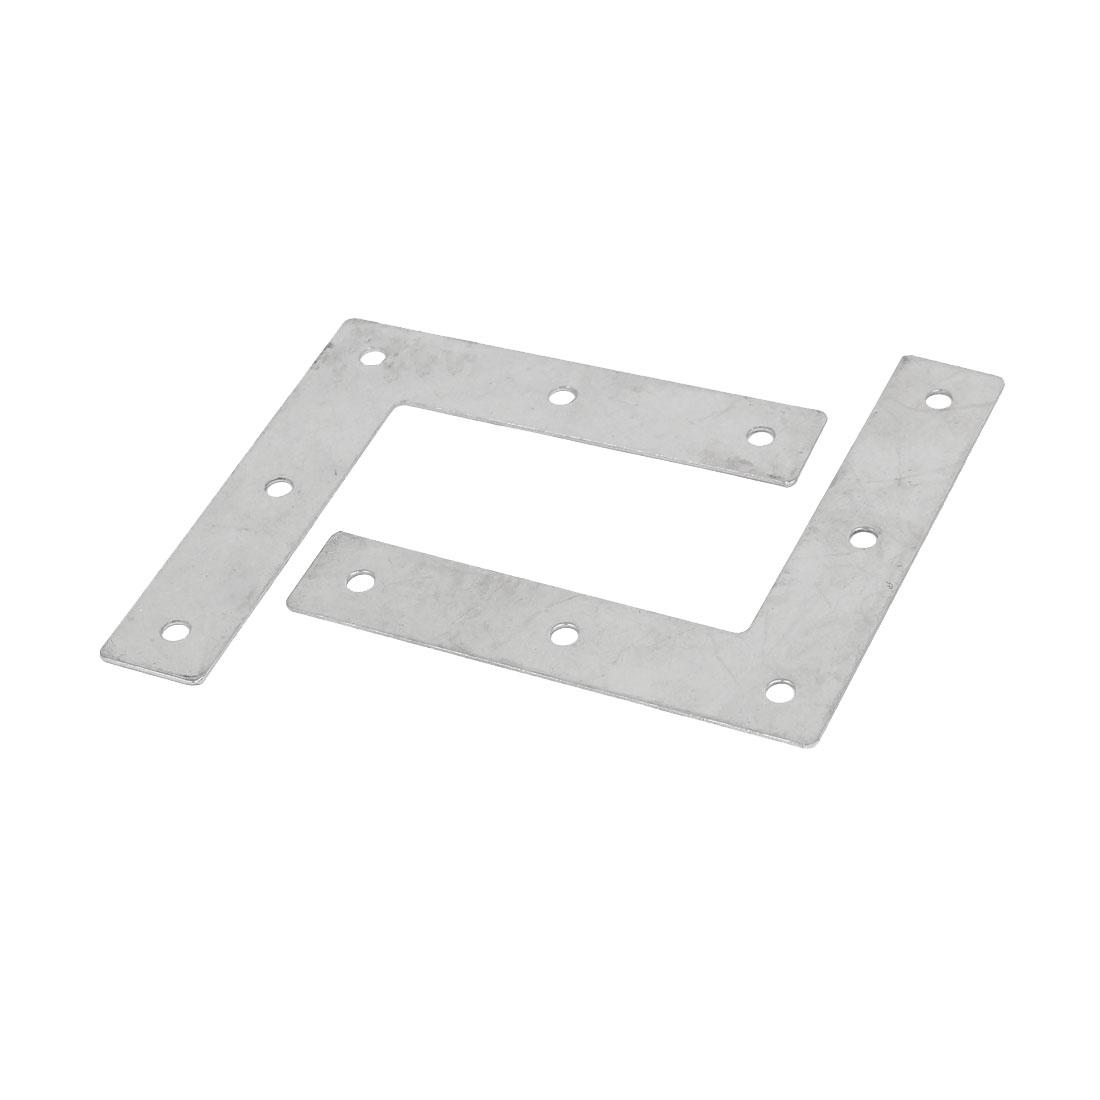 90mmx90mmx1mm Iron L Shaped 5 Holes Flat Fixing Plate Corner Brace Brackets 2pcs